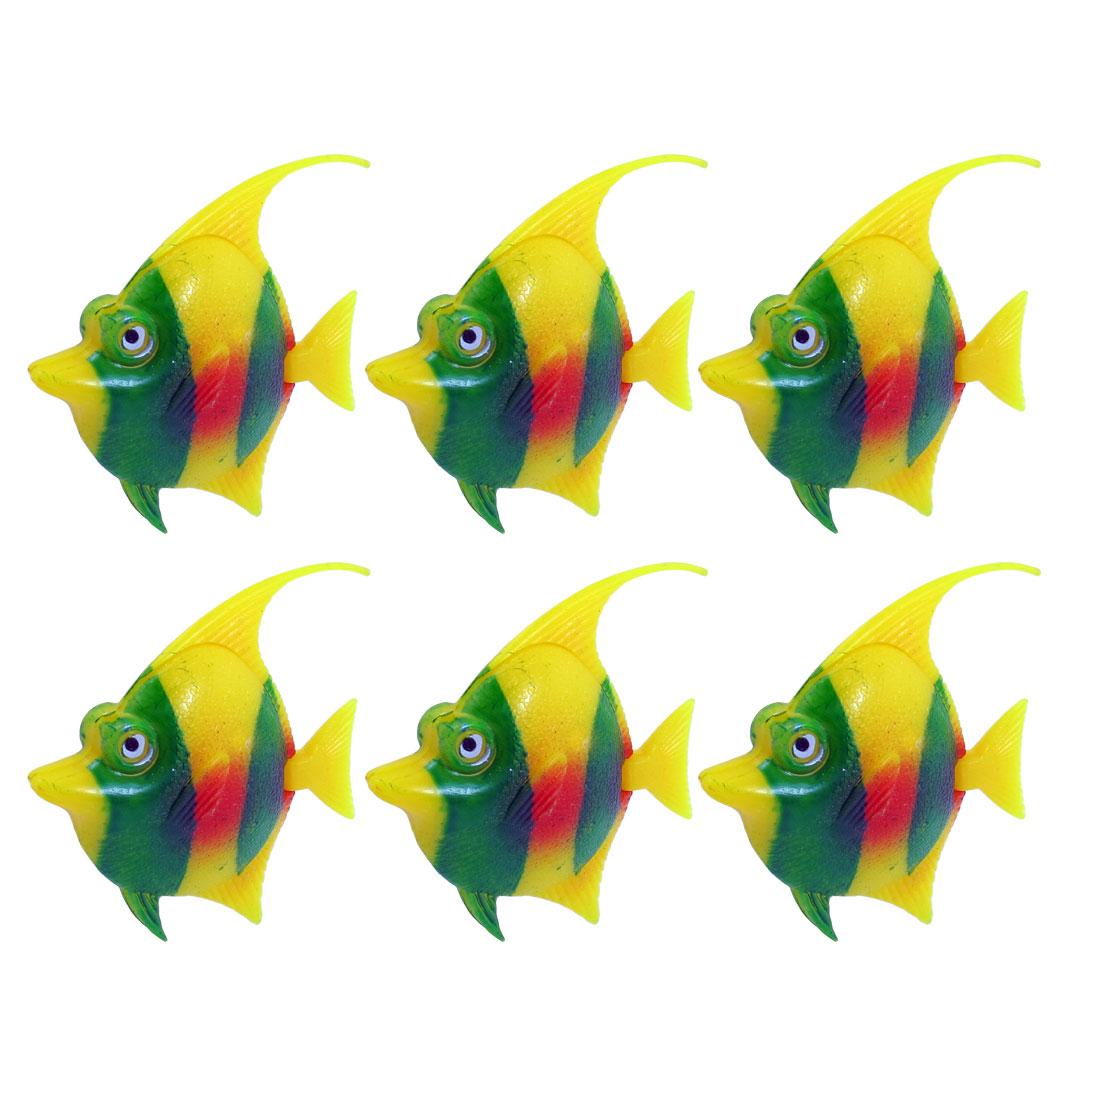 Unique Bargains Aquarium Tank Swing Tails Artificial Plastic Fishes Green Red Yellow 6 Pieces